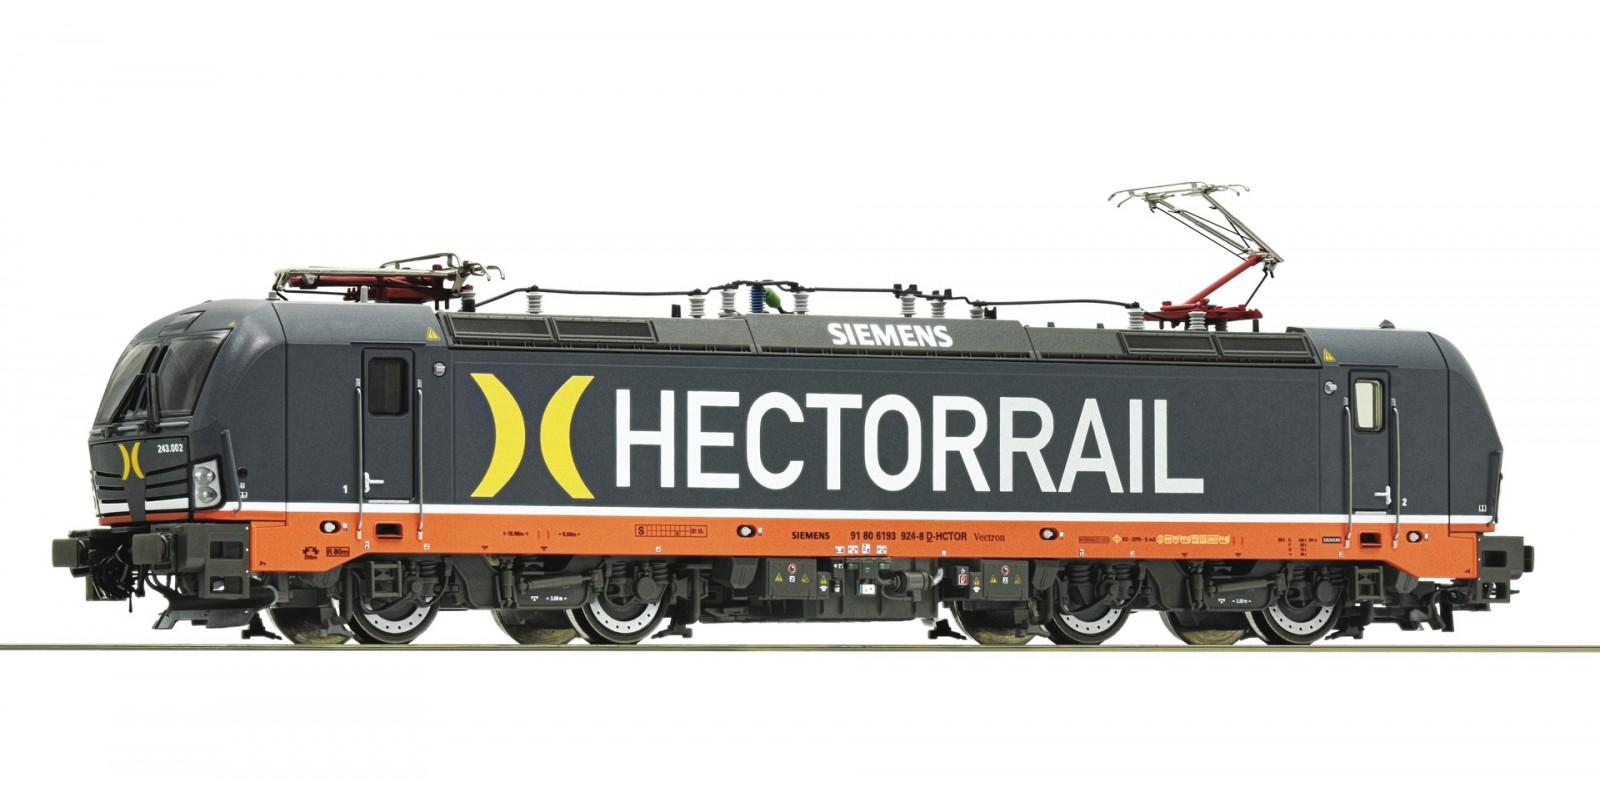 RO73311 - Electric locomotive 243-002, Hectorrail